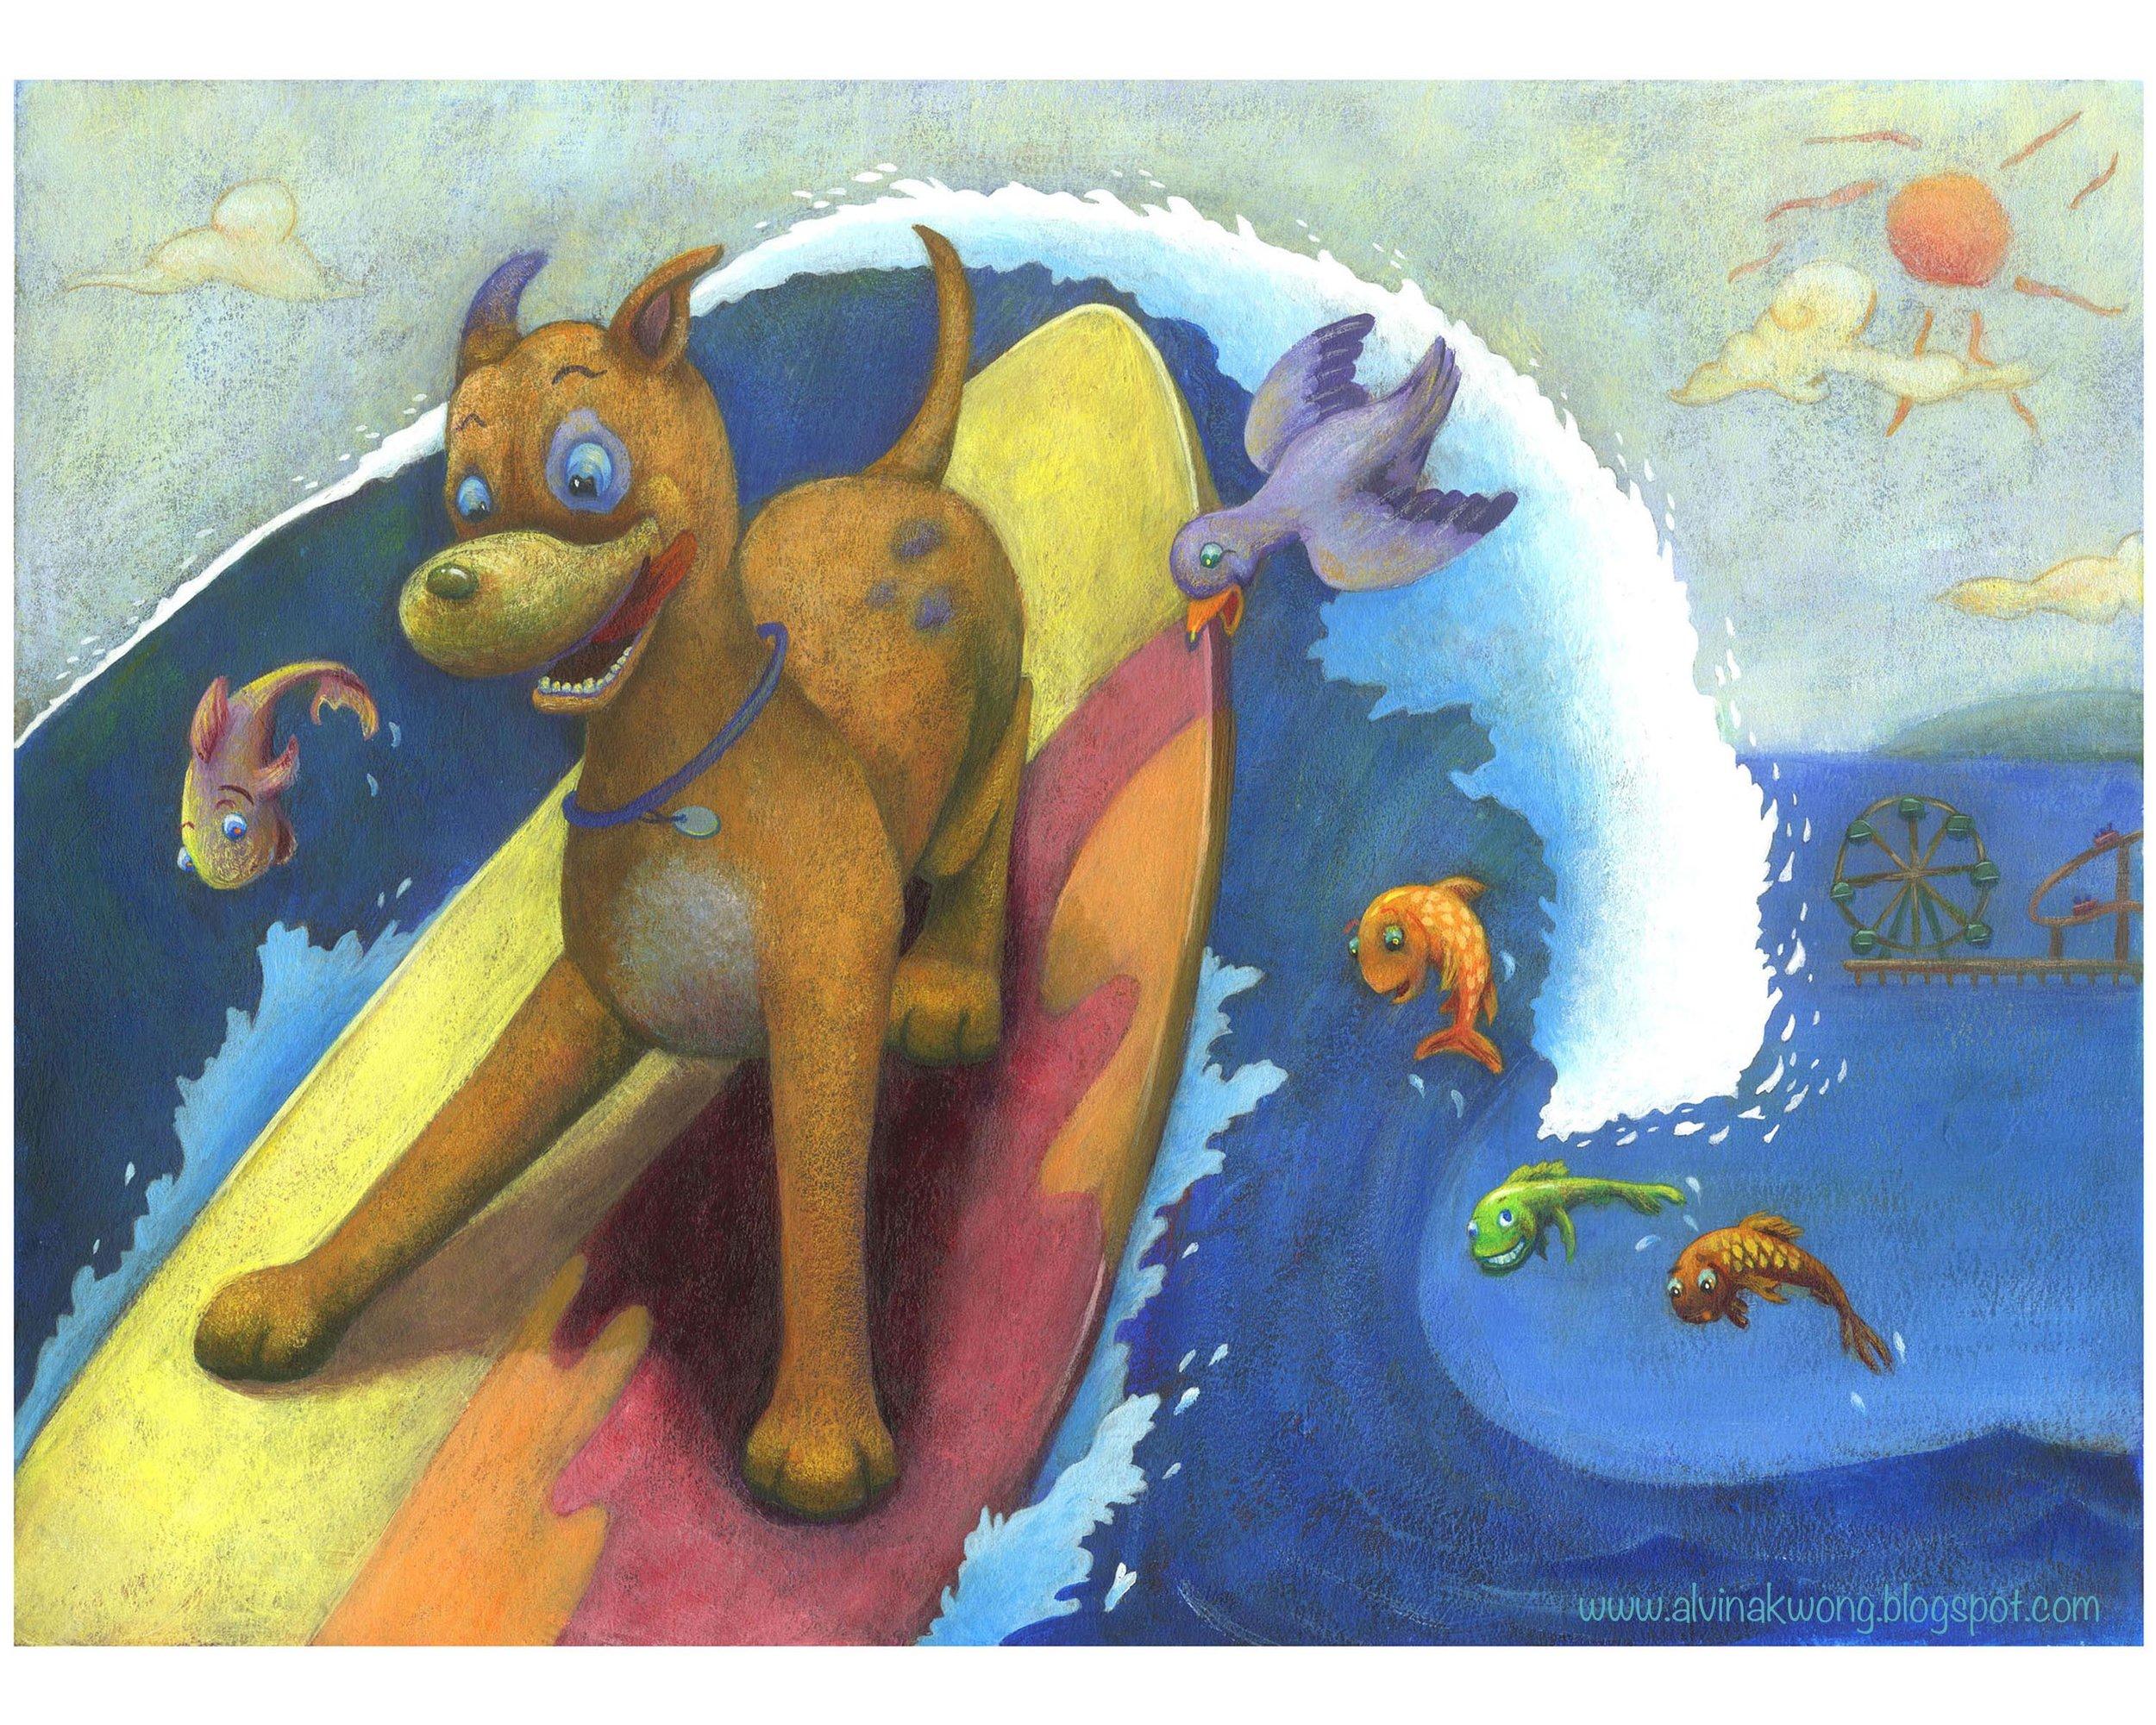 Surf Dog 300dpi watermark.jpg